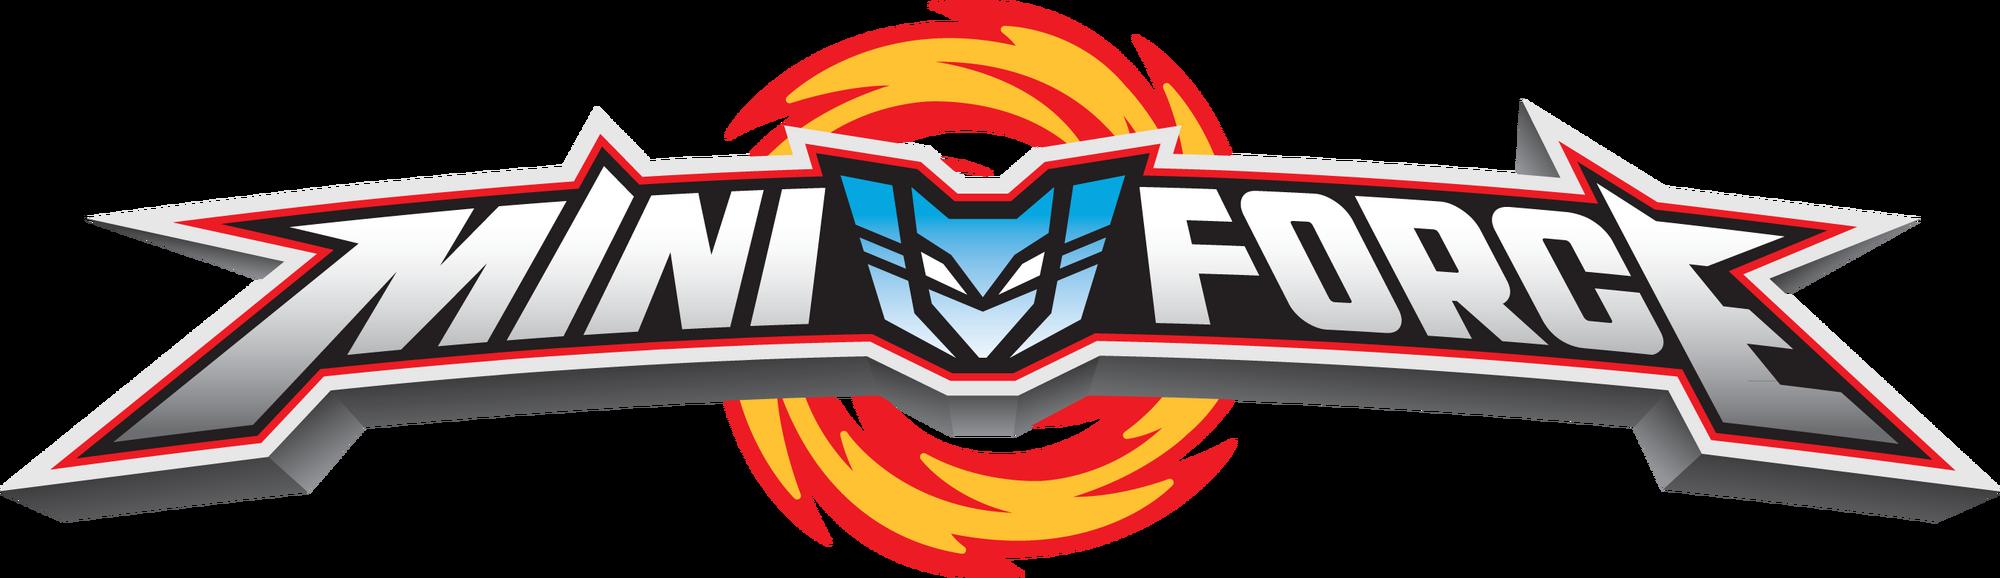 Miniforce Series Miniforce Wiki Fandom Powered By Wikia